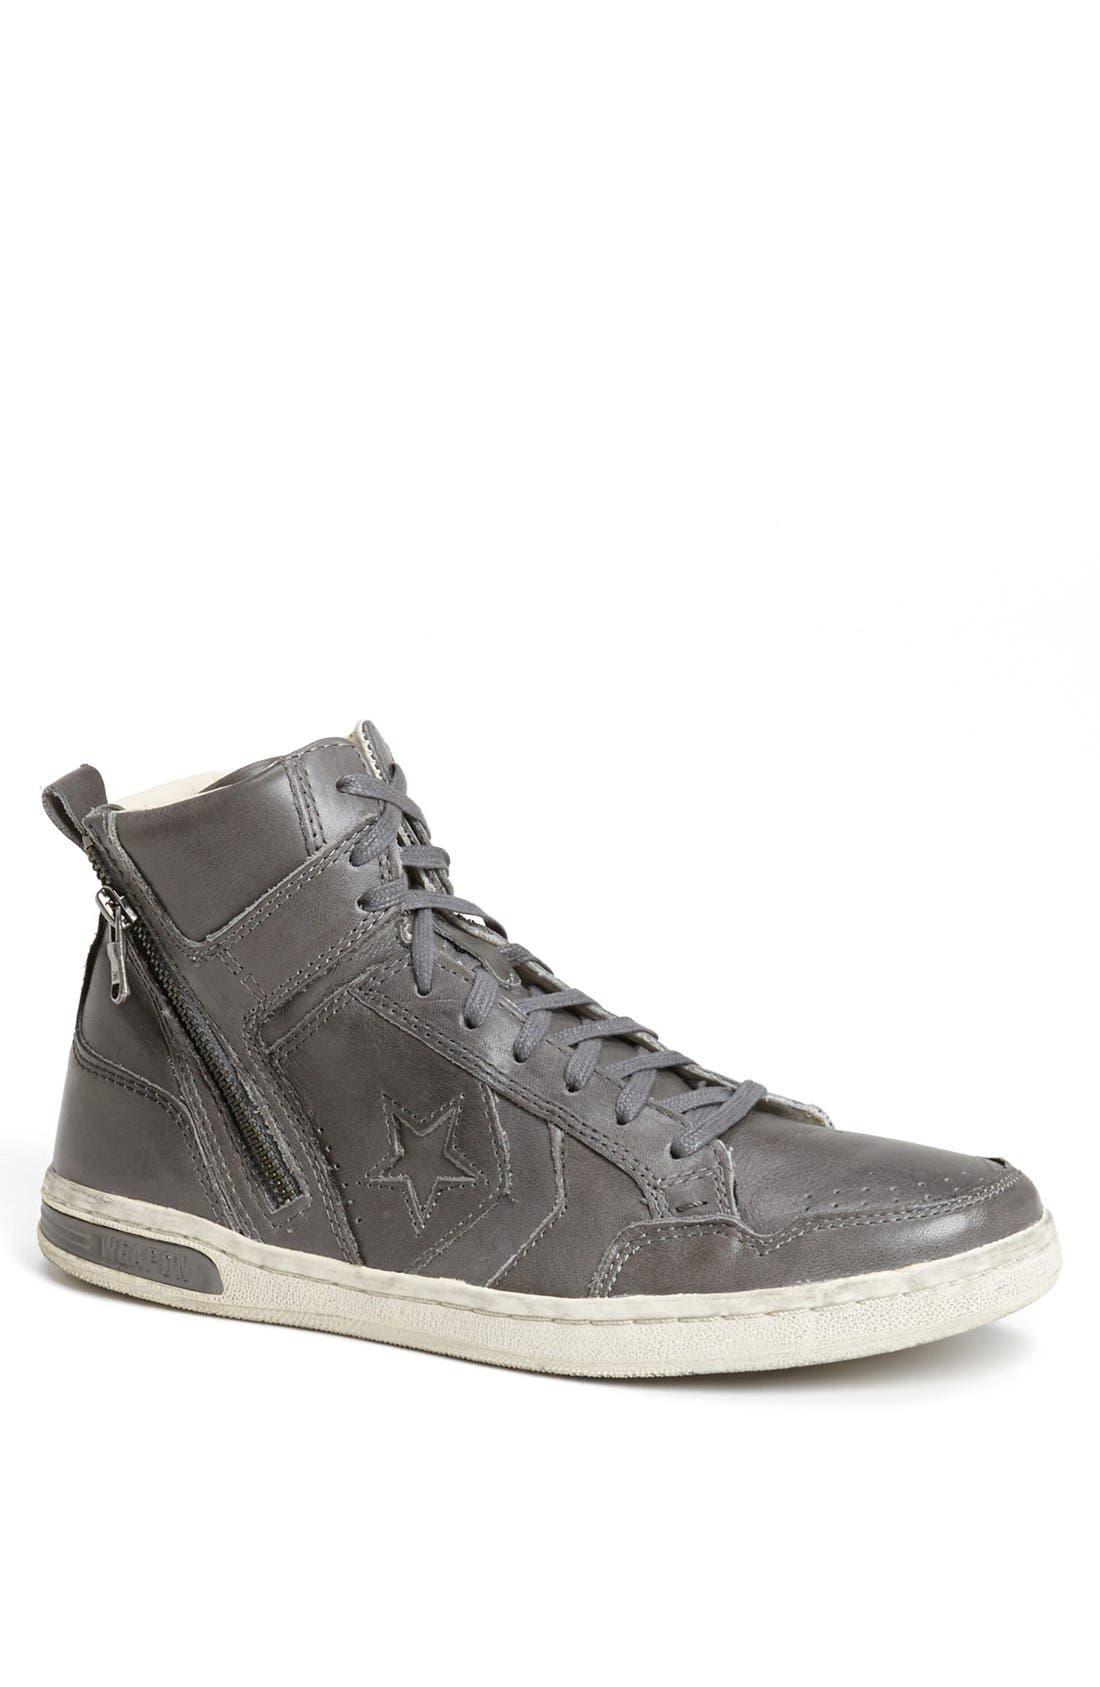 Main Image - Converse by John Varvatos 'JV Weapon' Sneaker (Men)